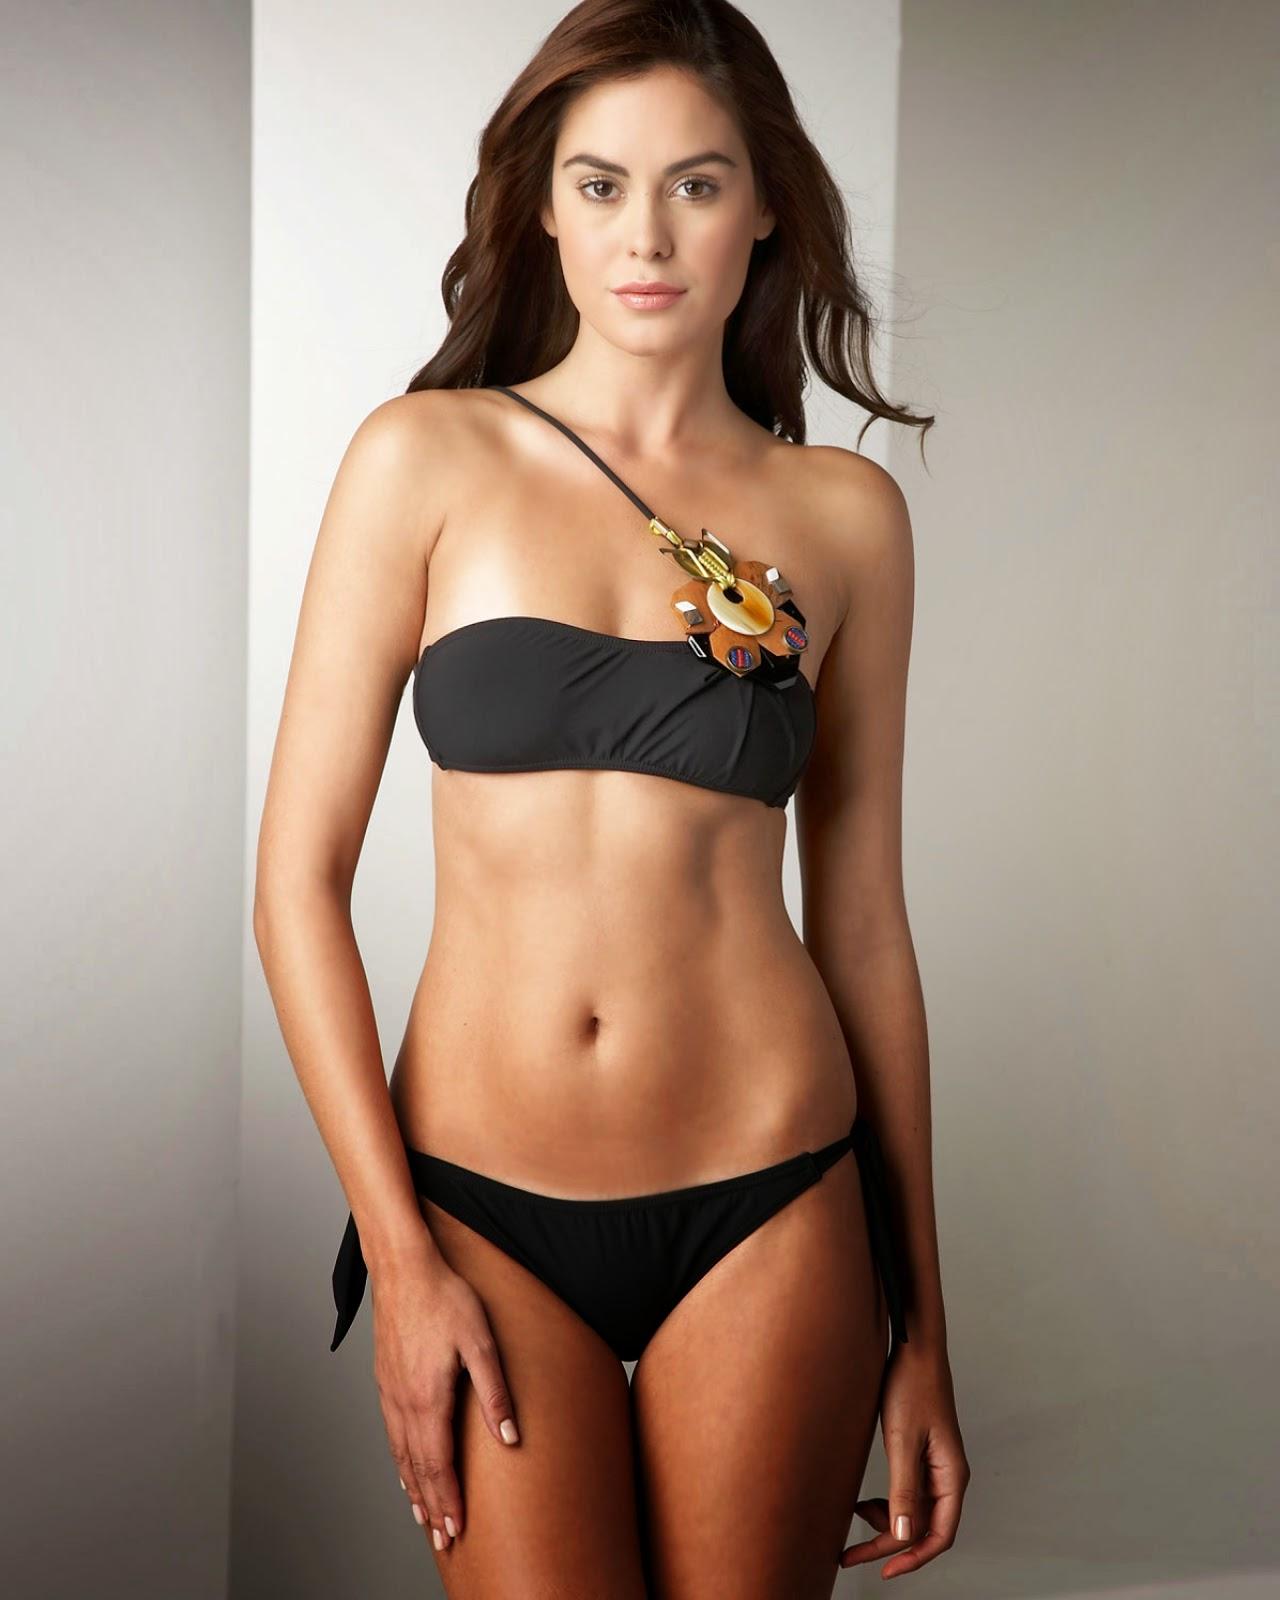 Marina Theiss Bikini Pictures  Bikini Models-7106